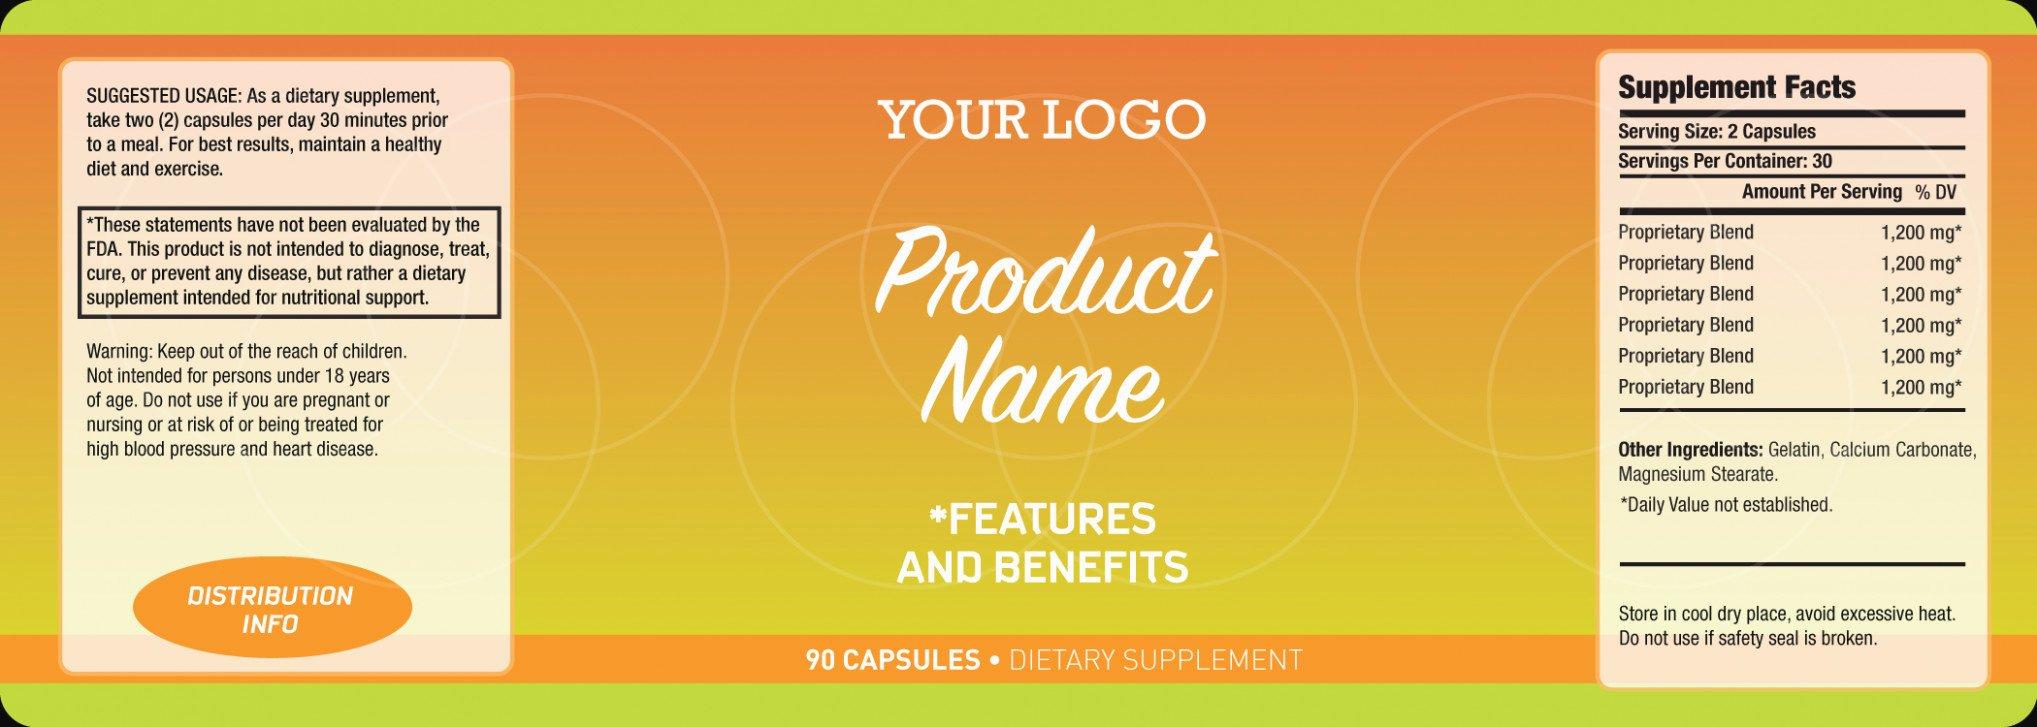 Cvs Prescription Label Template Elegant the Modern Rules